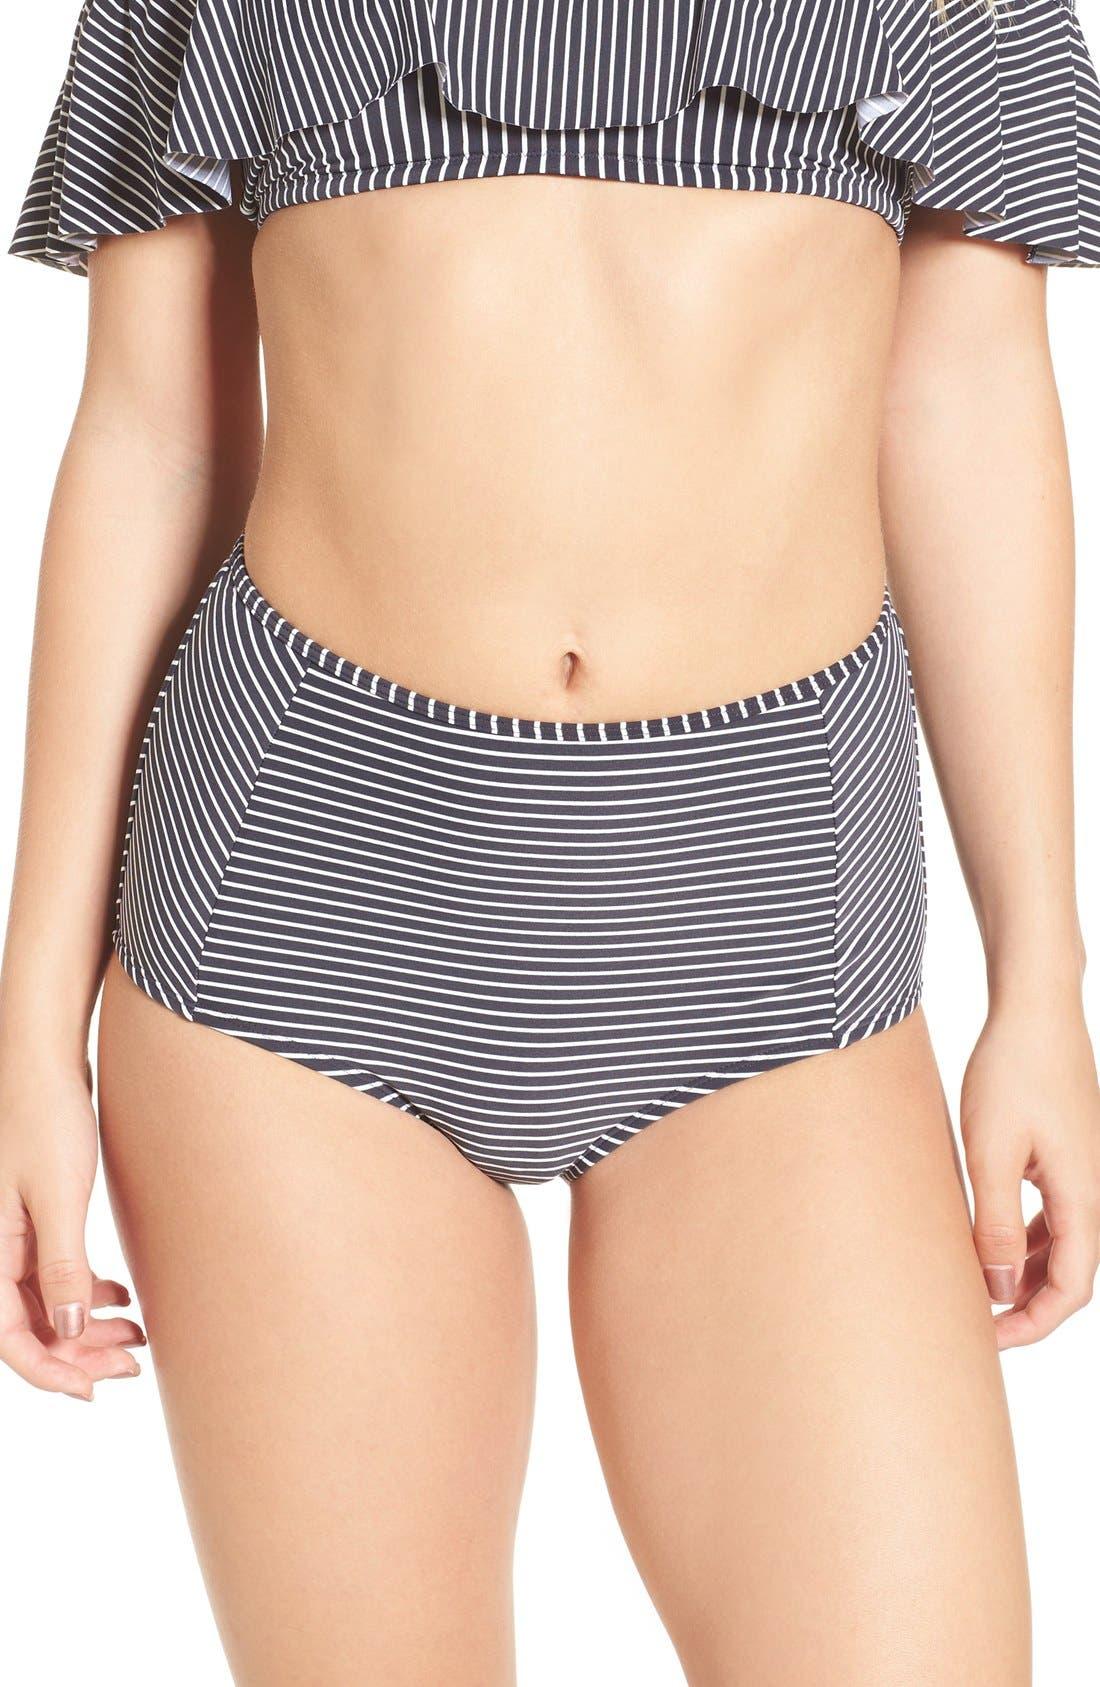 Alternate Image 1 Selected - Billabong Retro High Waist Bikini Bottoms